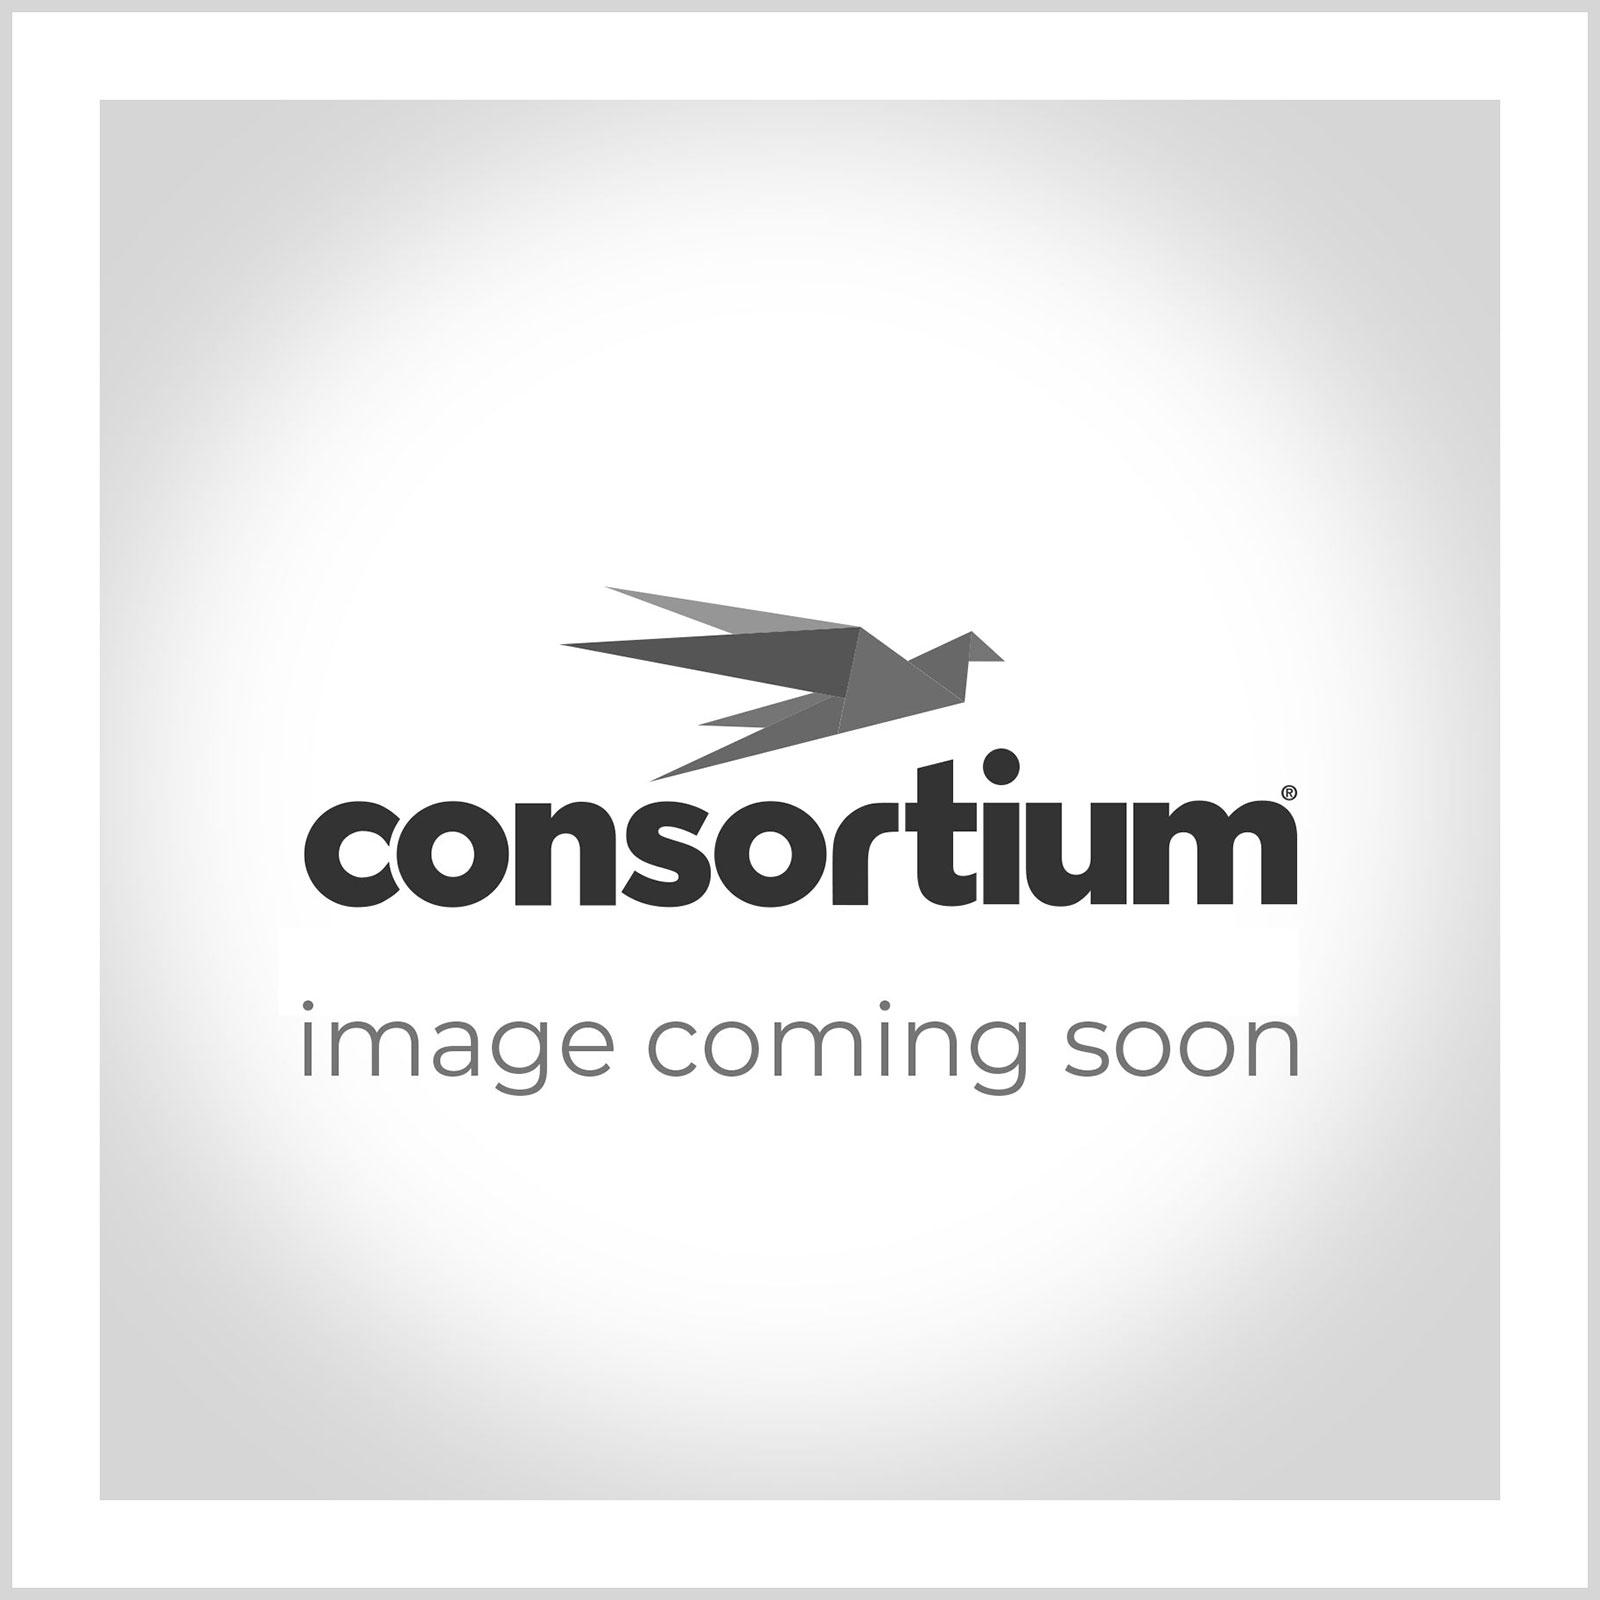 Consortium Sticky Note Cube Bulk Buy 5 Pack